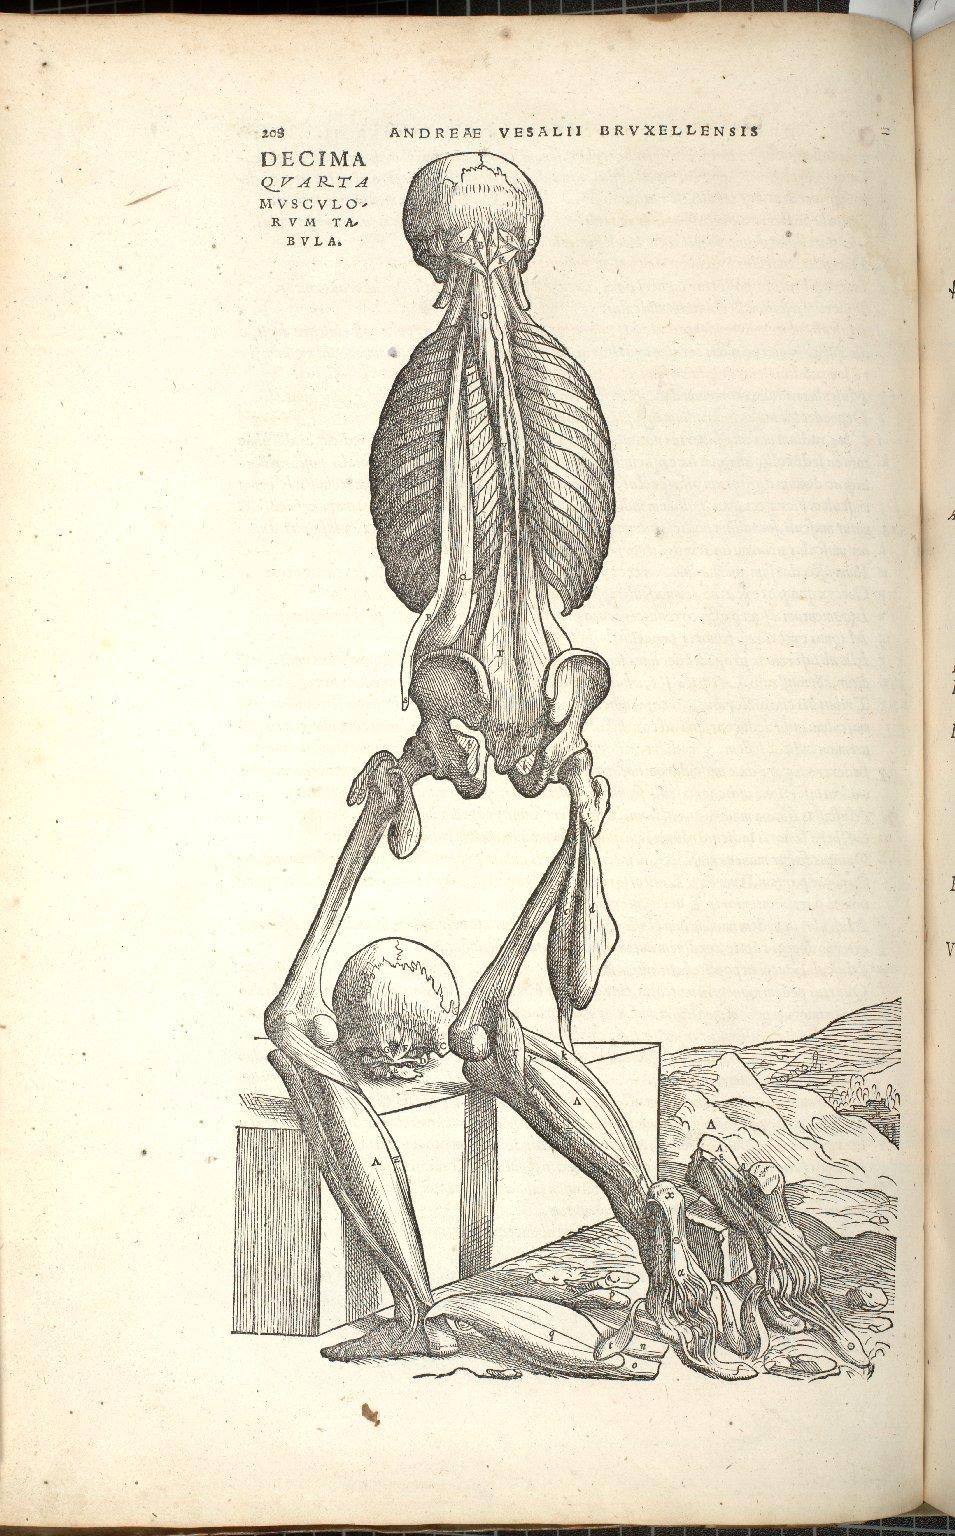 Decima Quarta Musculorum Tabula